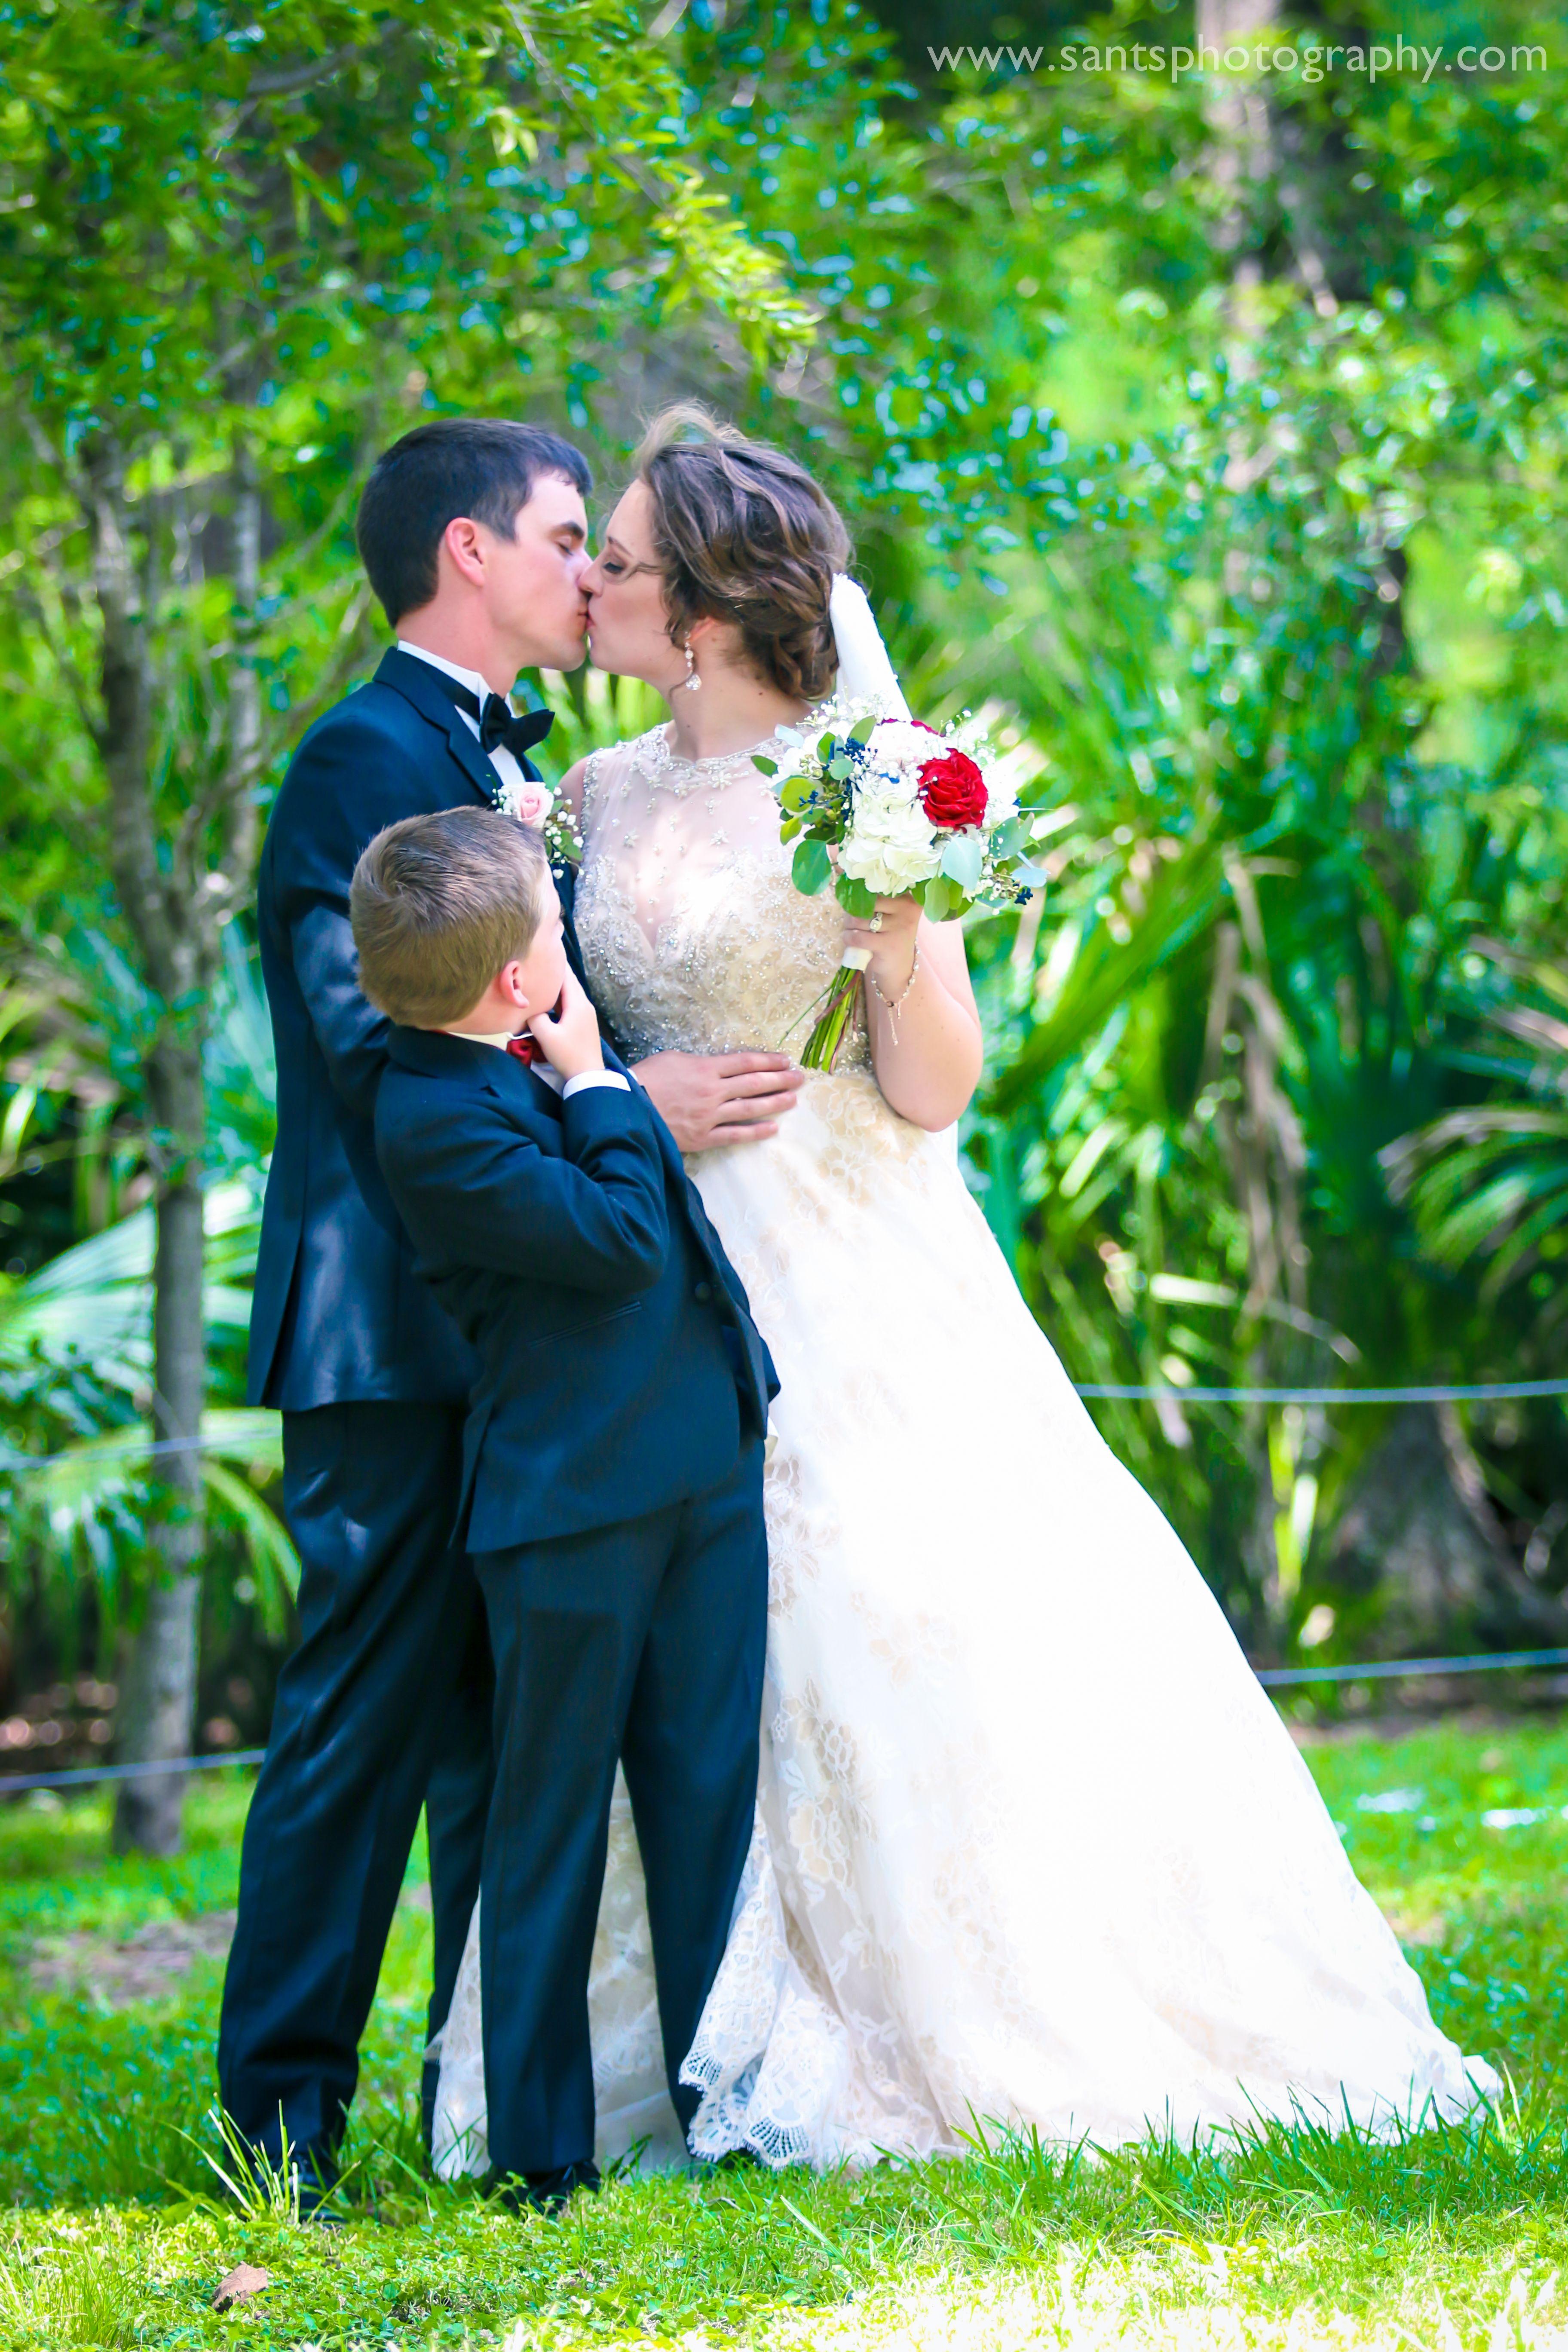 Cute kid in wedding photo wedding with kids wedding